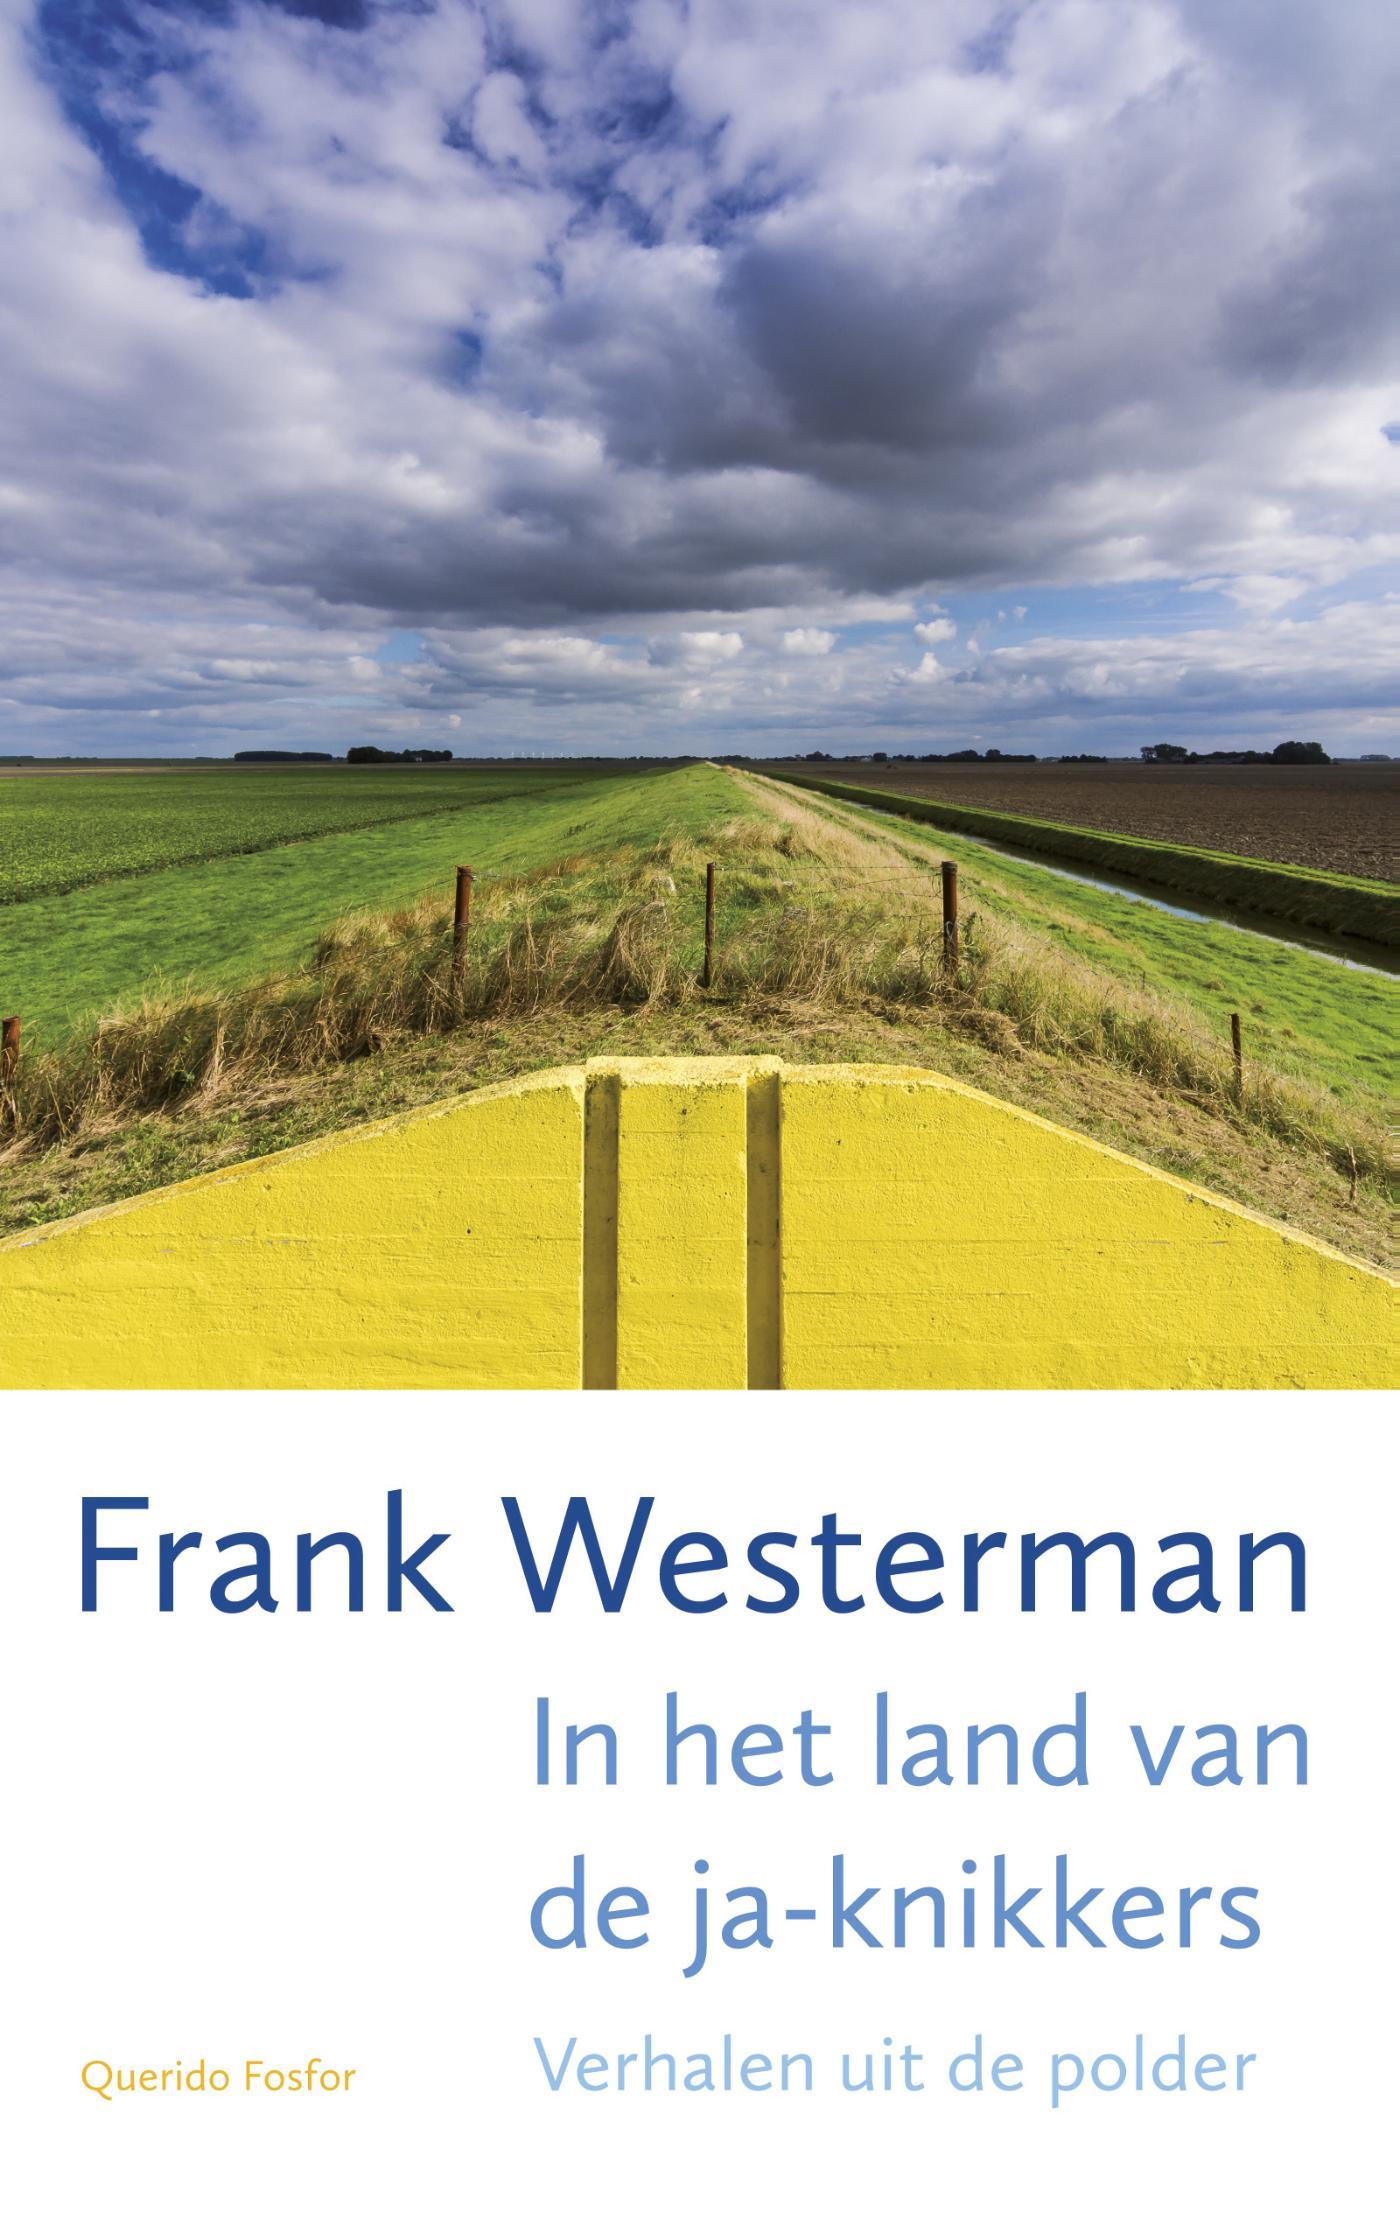 In het land van de ja-knikkers | Frank Westerman 9789021406145 Frank Westerman Singel   Reisverhalen Nederland